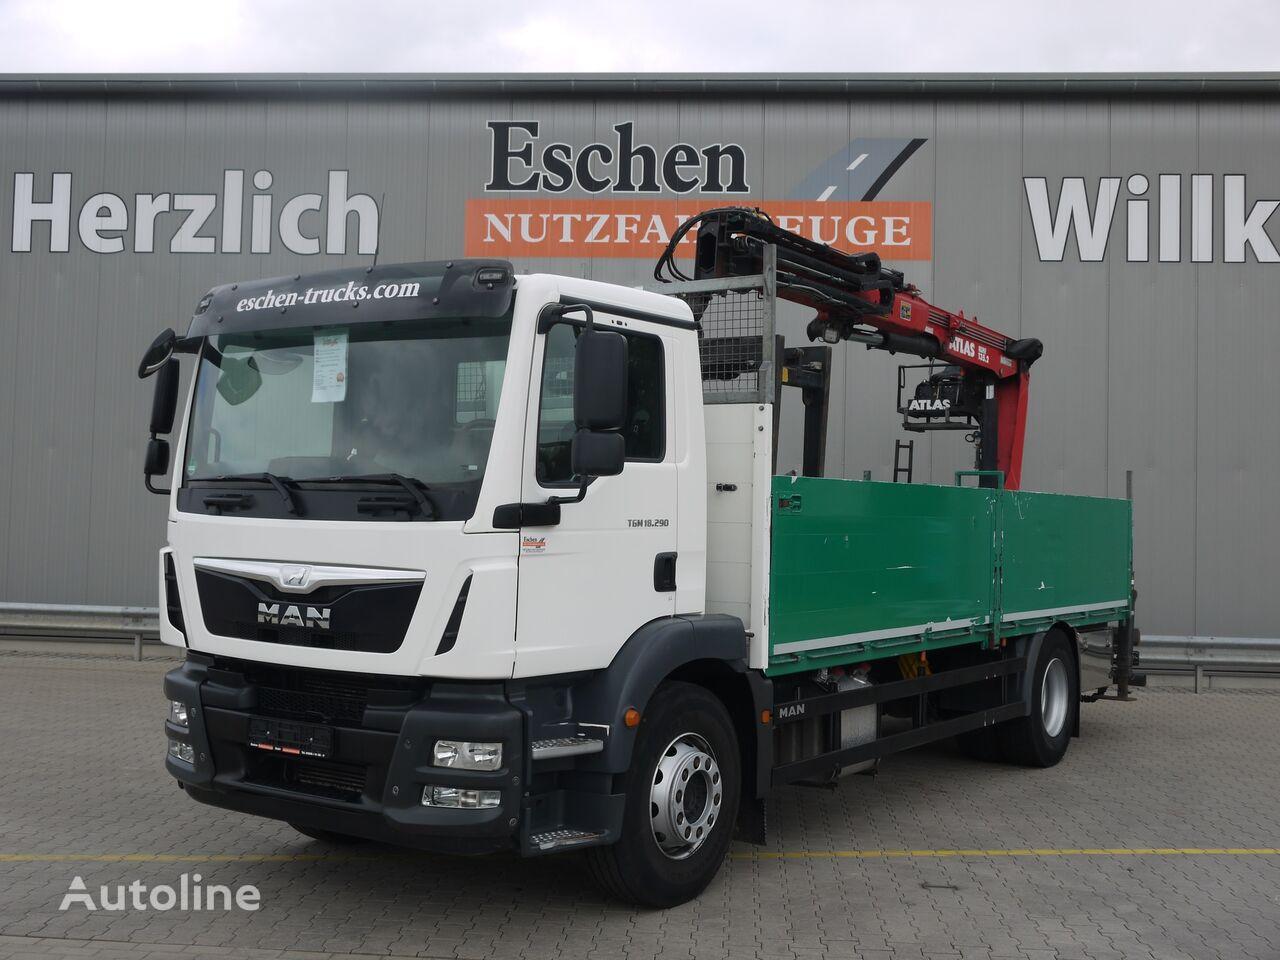 MAN TGM 18.290BL, Atlas 135.2 Kran, Automatik, Euro 6 flatbed truck